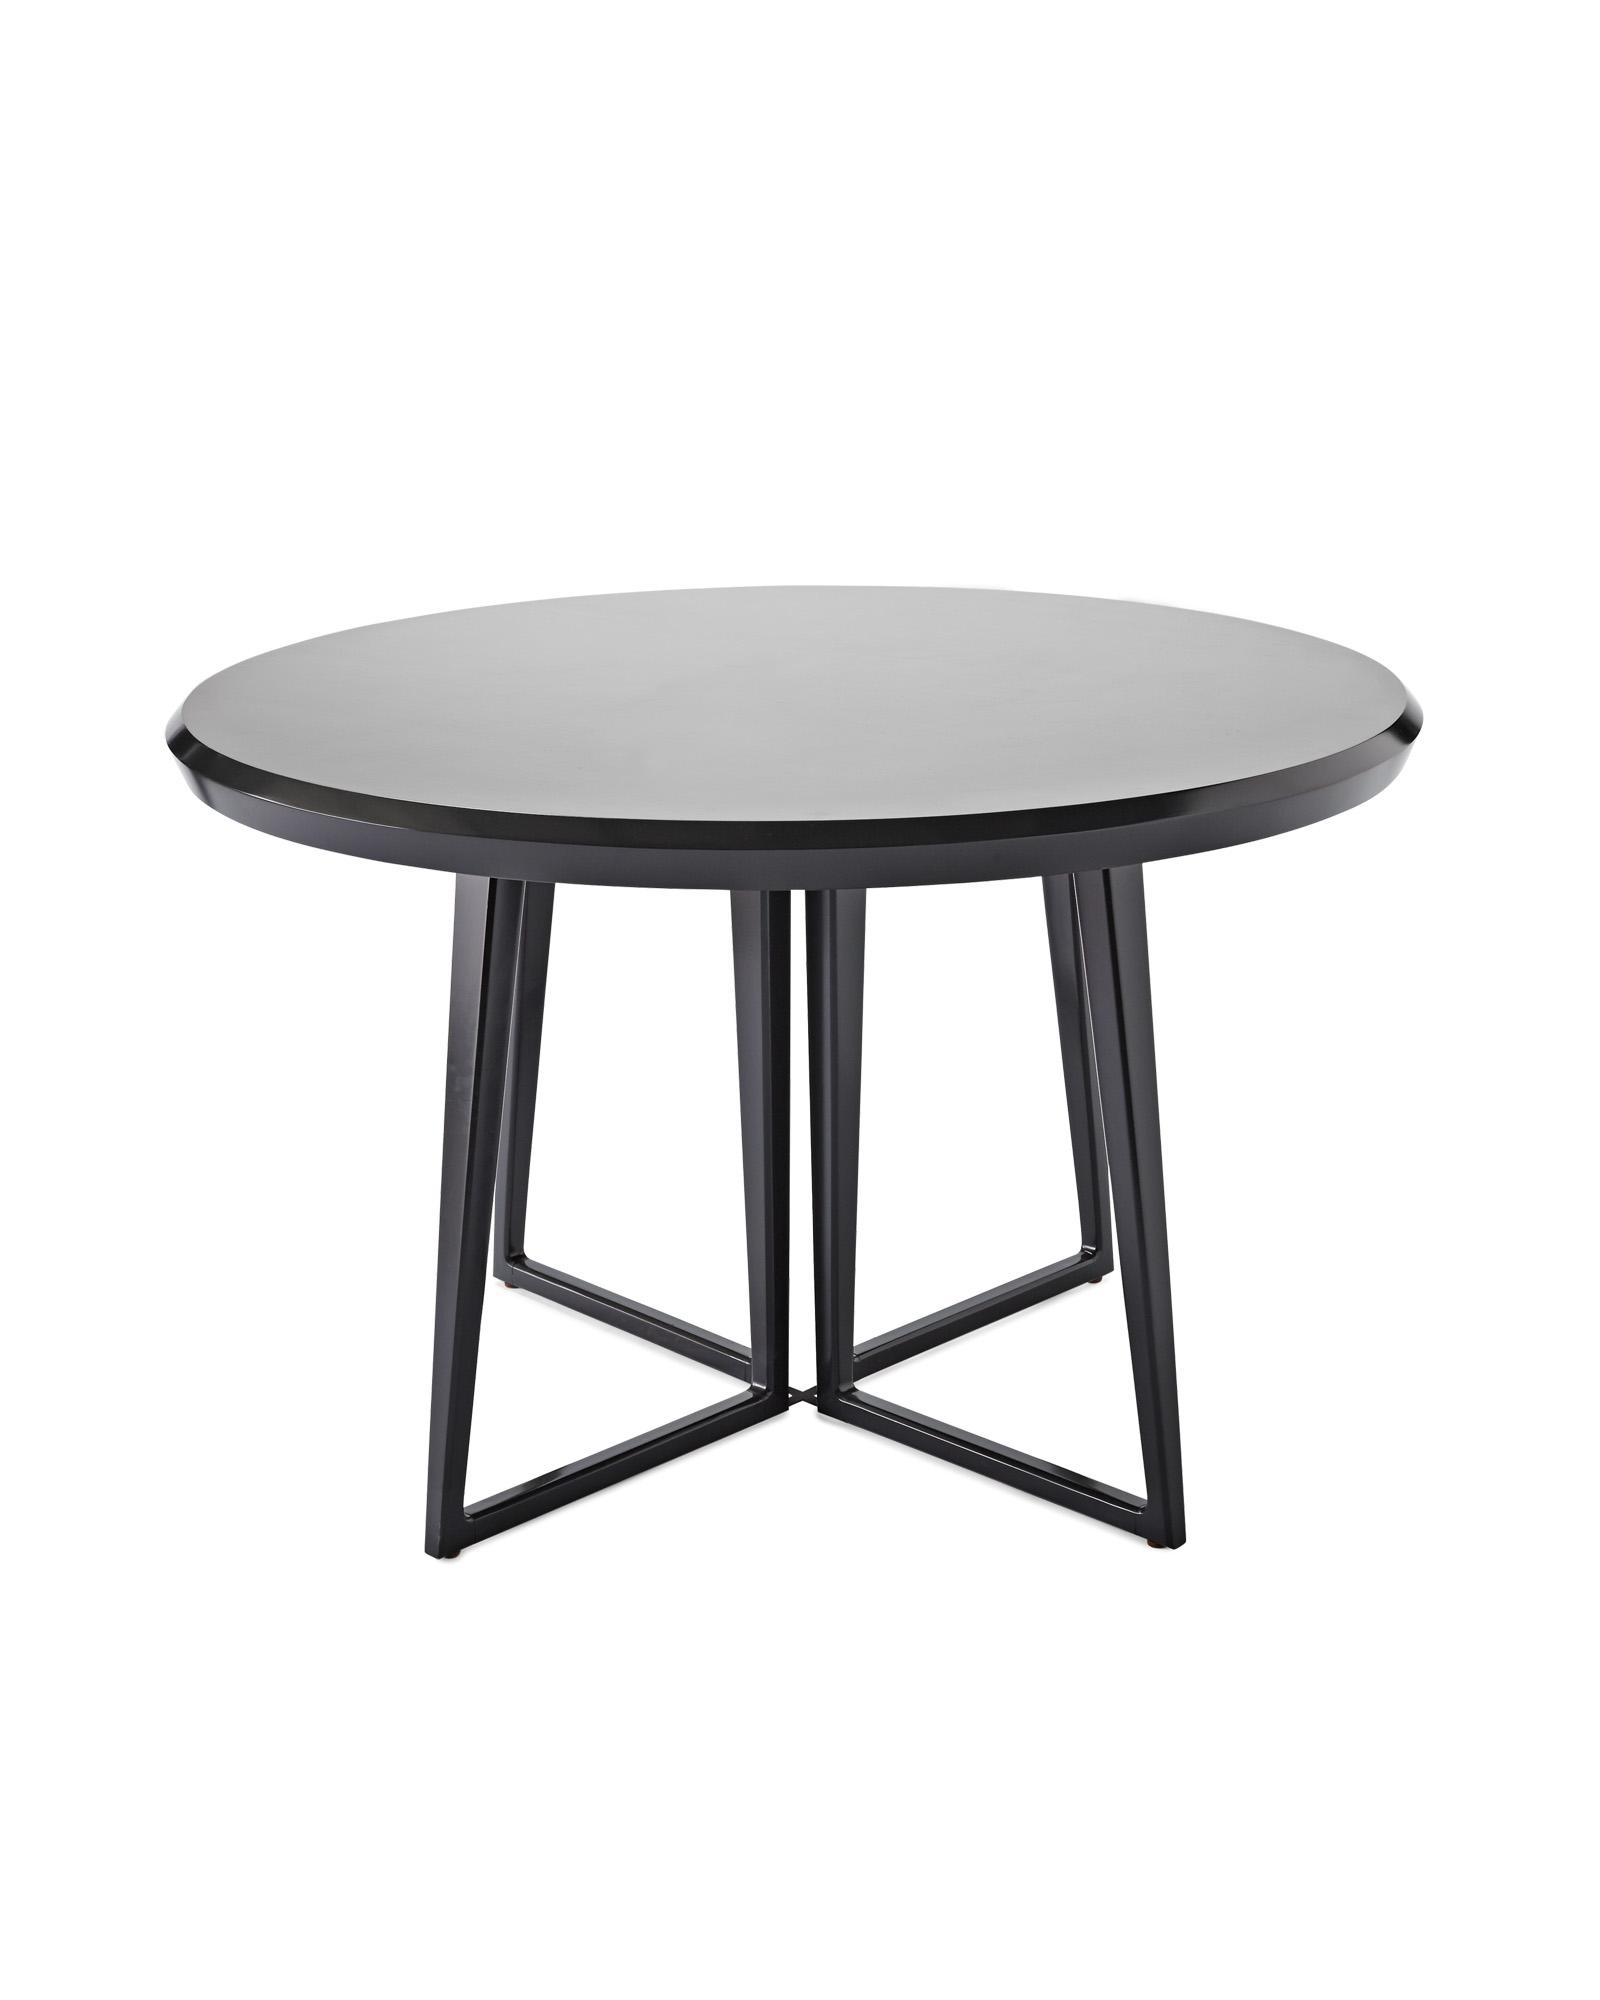 Furn_Dining_Table_Downing_Round_Pewter_MV_Crop_SH.jpg